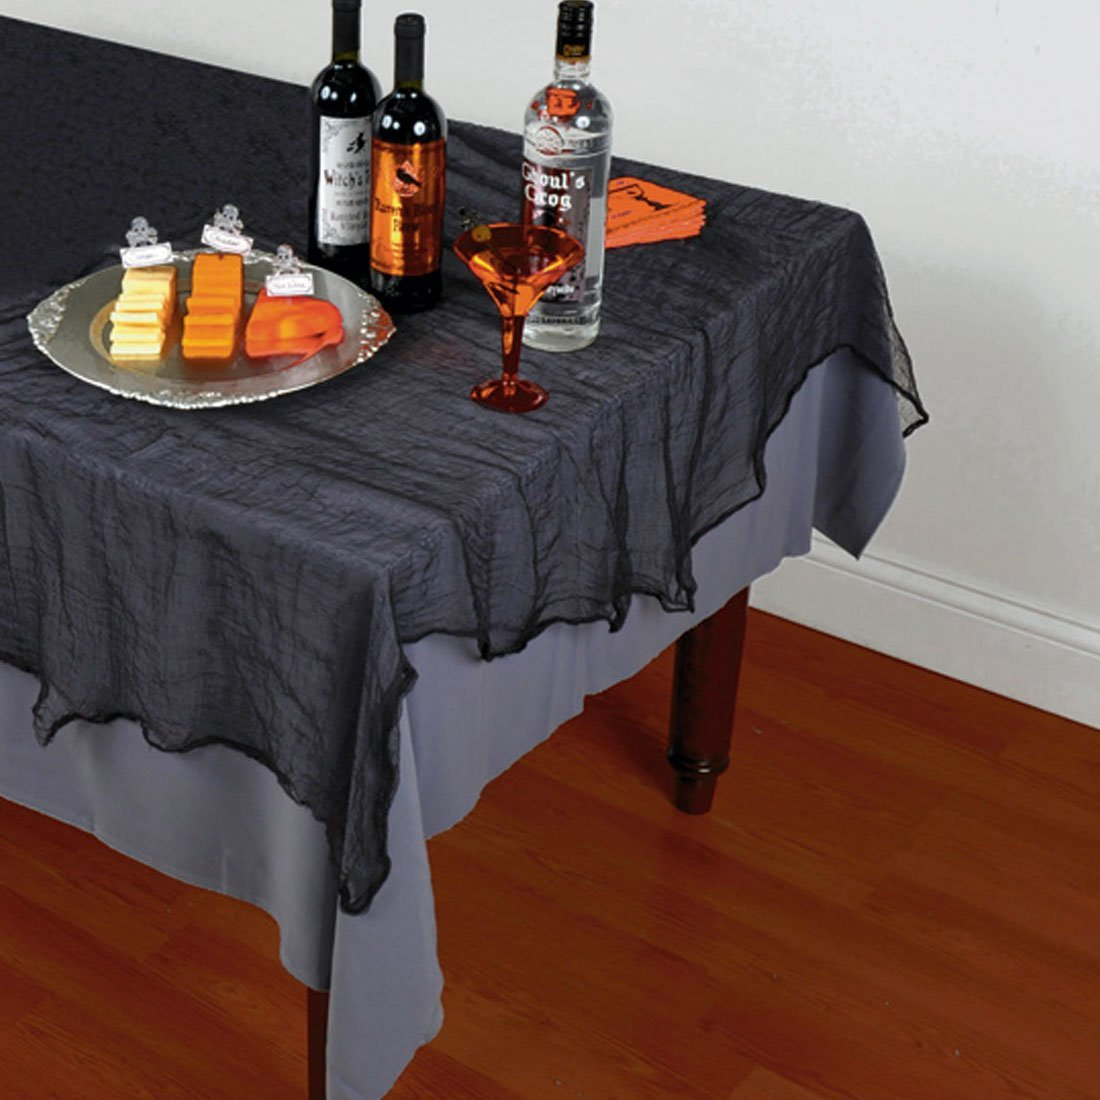 NET TOYS Halloween Tischdecke 150 x 210 cm Tischdeko Tisch Decke Tischtuch Leinenlook Halloweendeko